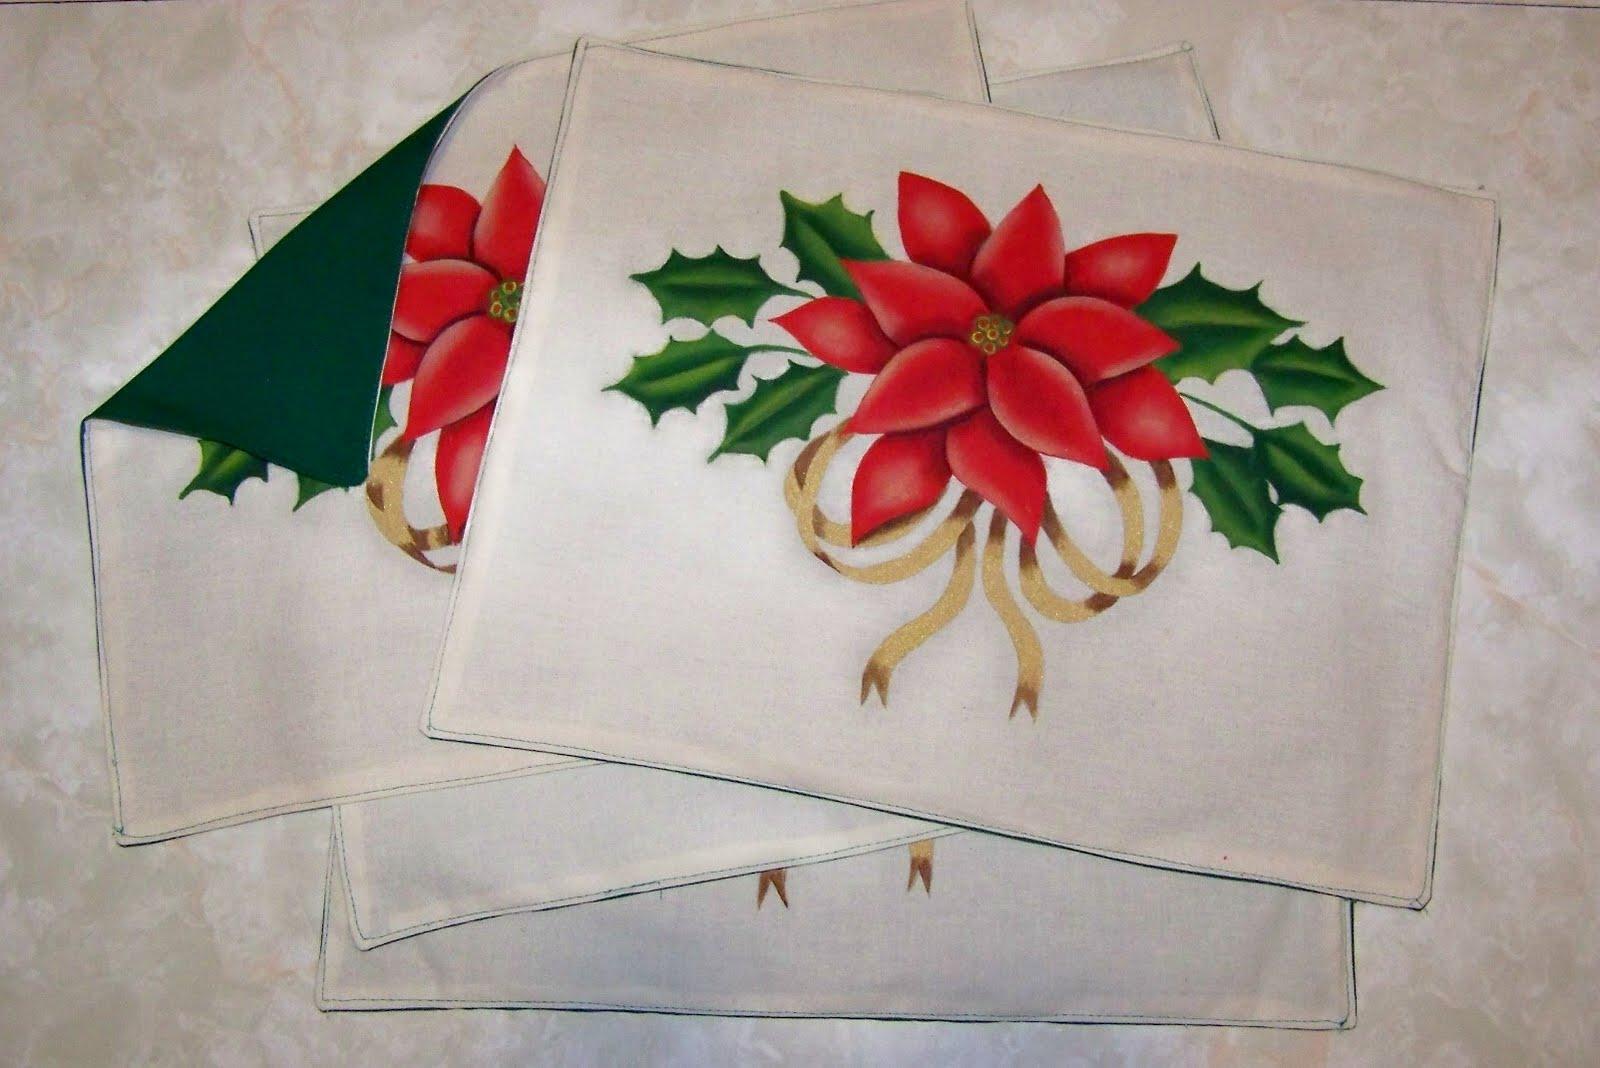 Bienvendidos manteles navide os - Manteles de navidad ...